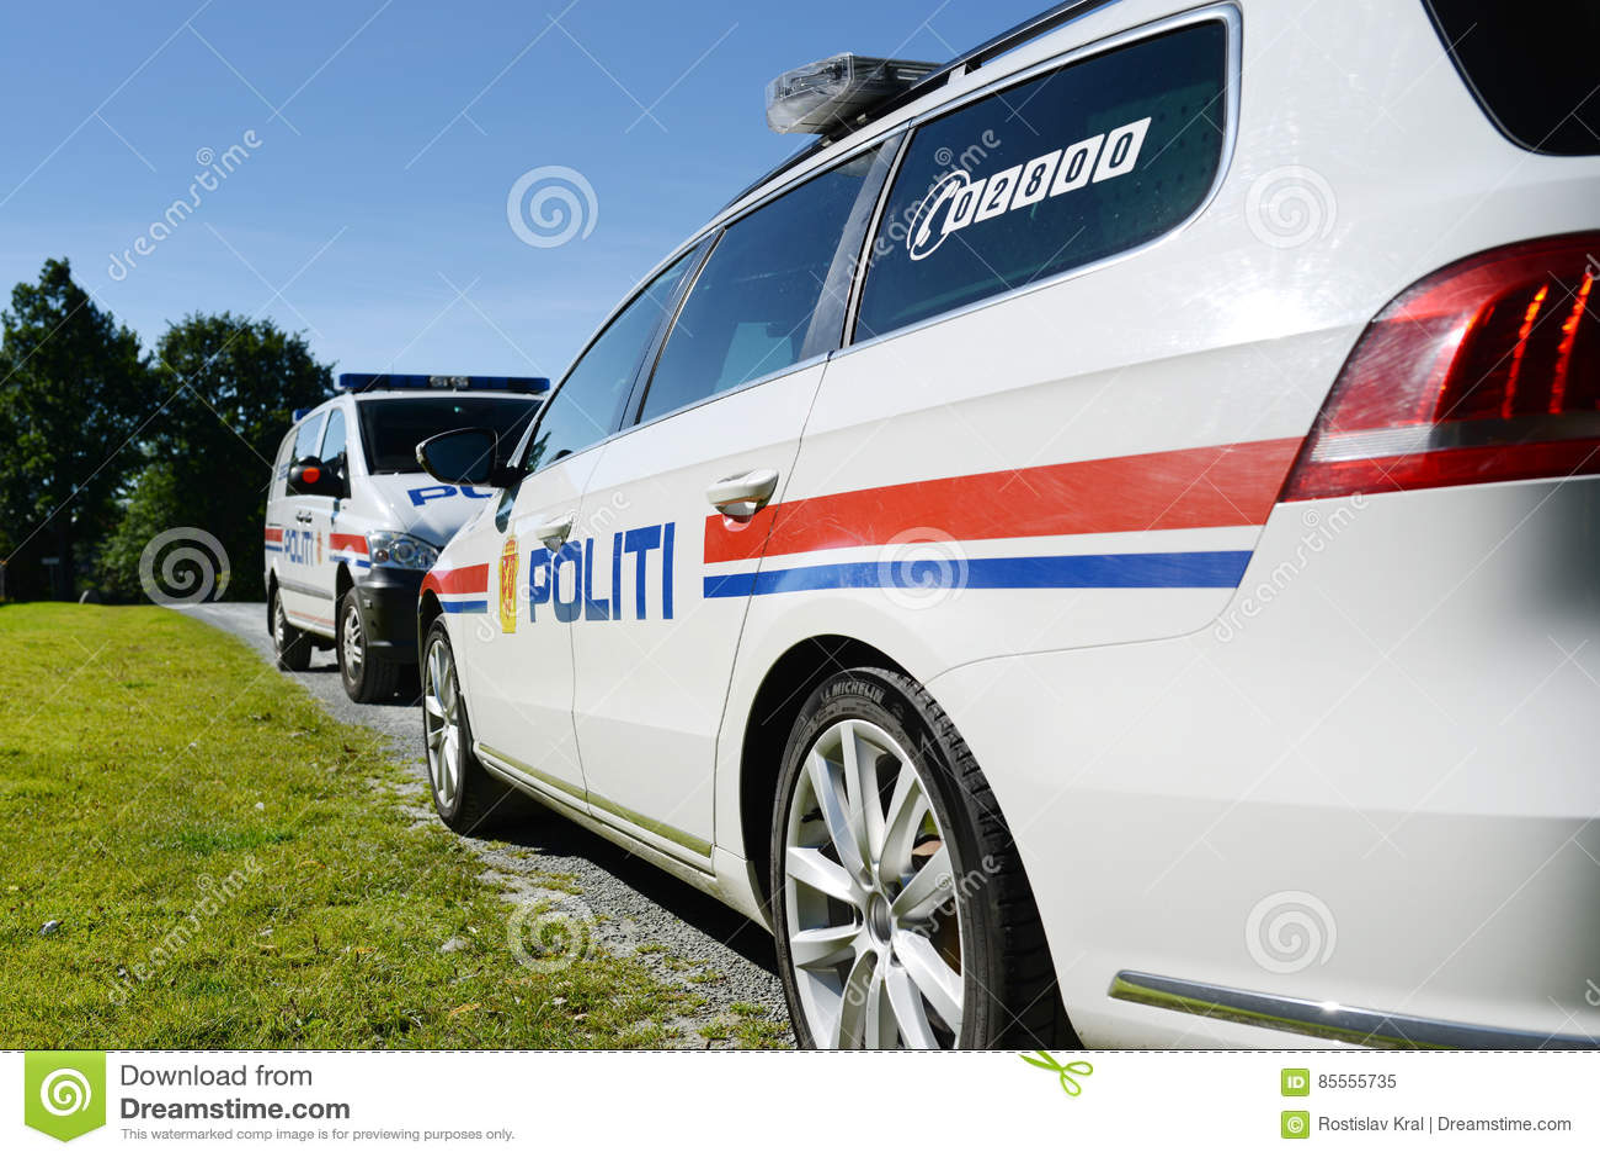 Norwegische Polizei